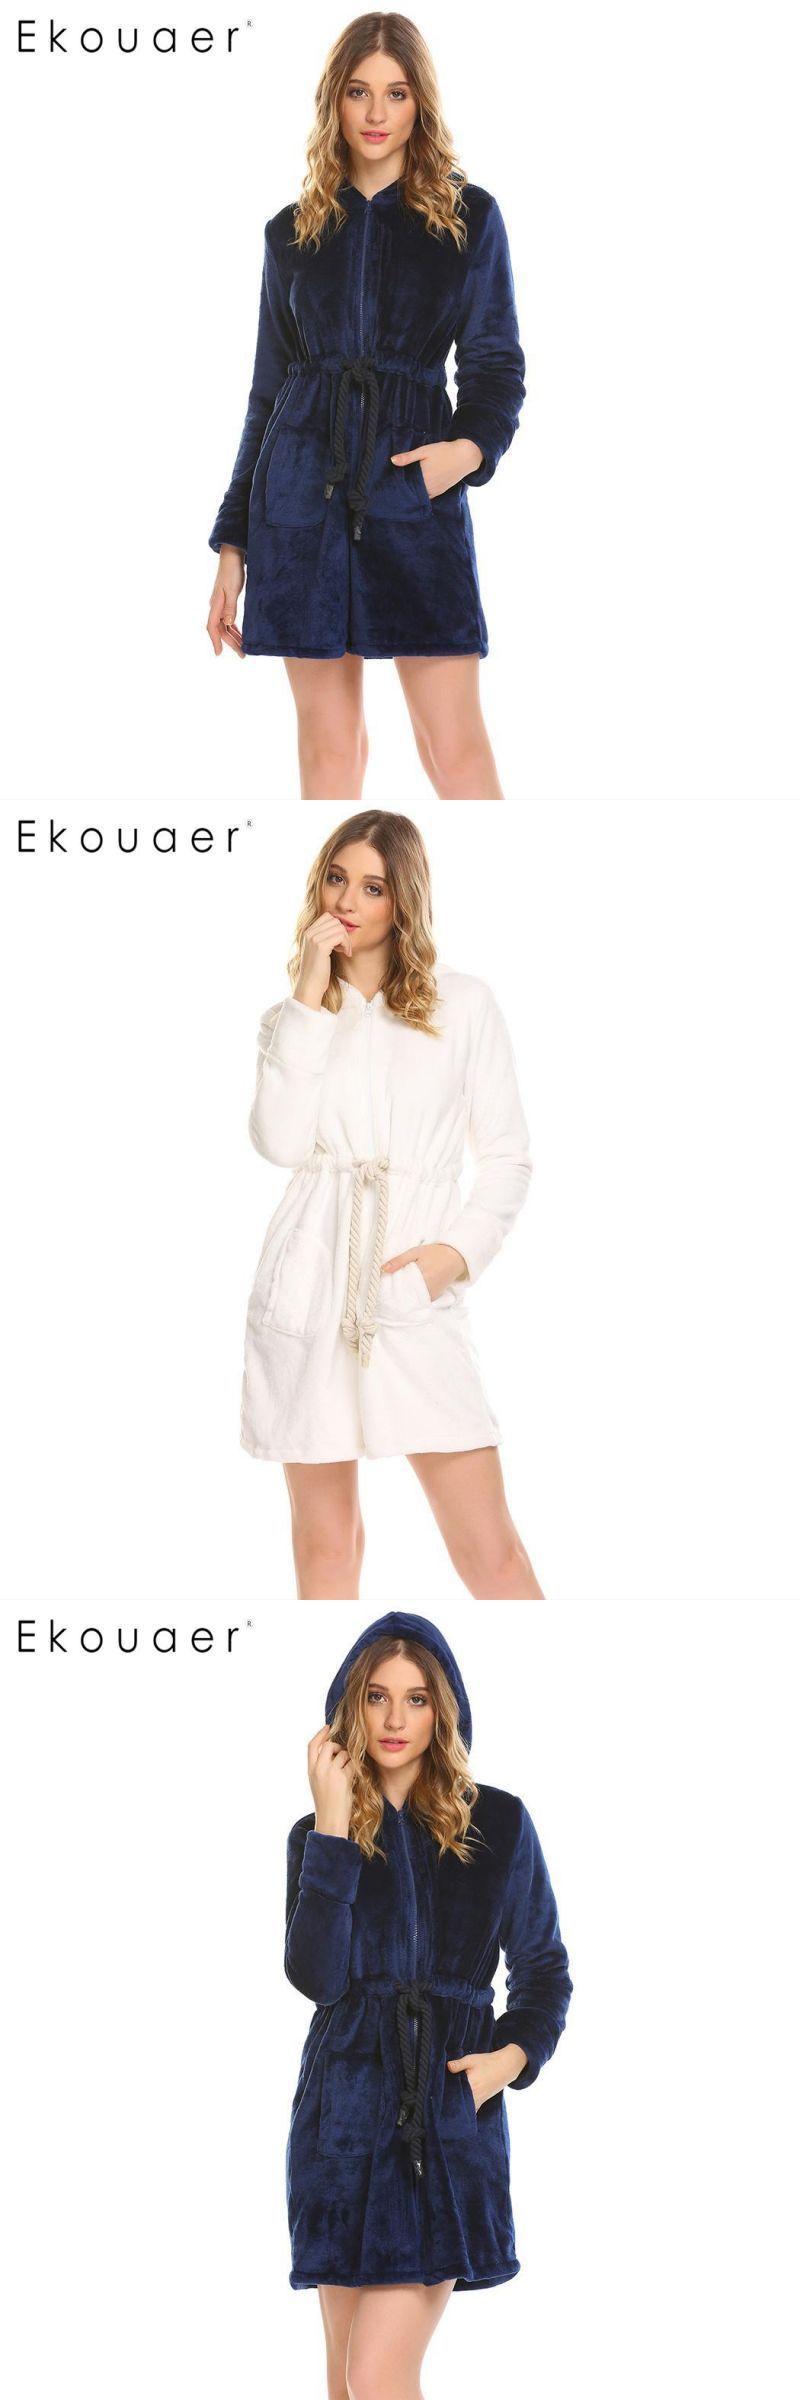 584bf093a5 Women bathrobe sleepwear winter warm robe dressing gown casual hooded long  sleeve zipper bathrobes home wear clothes  women  robes  100%  polyester   above ...